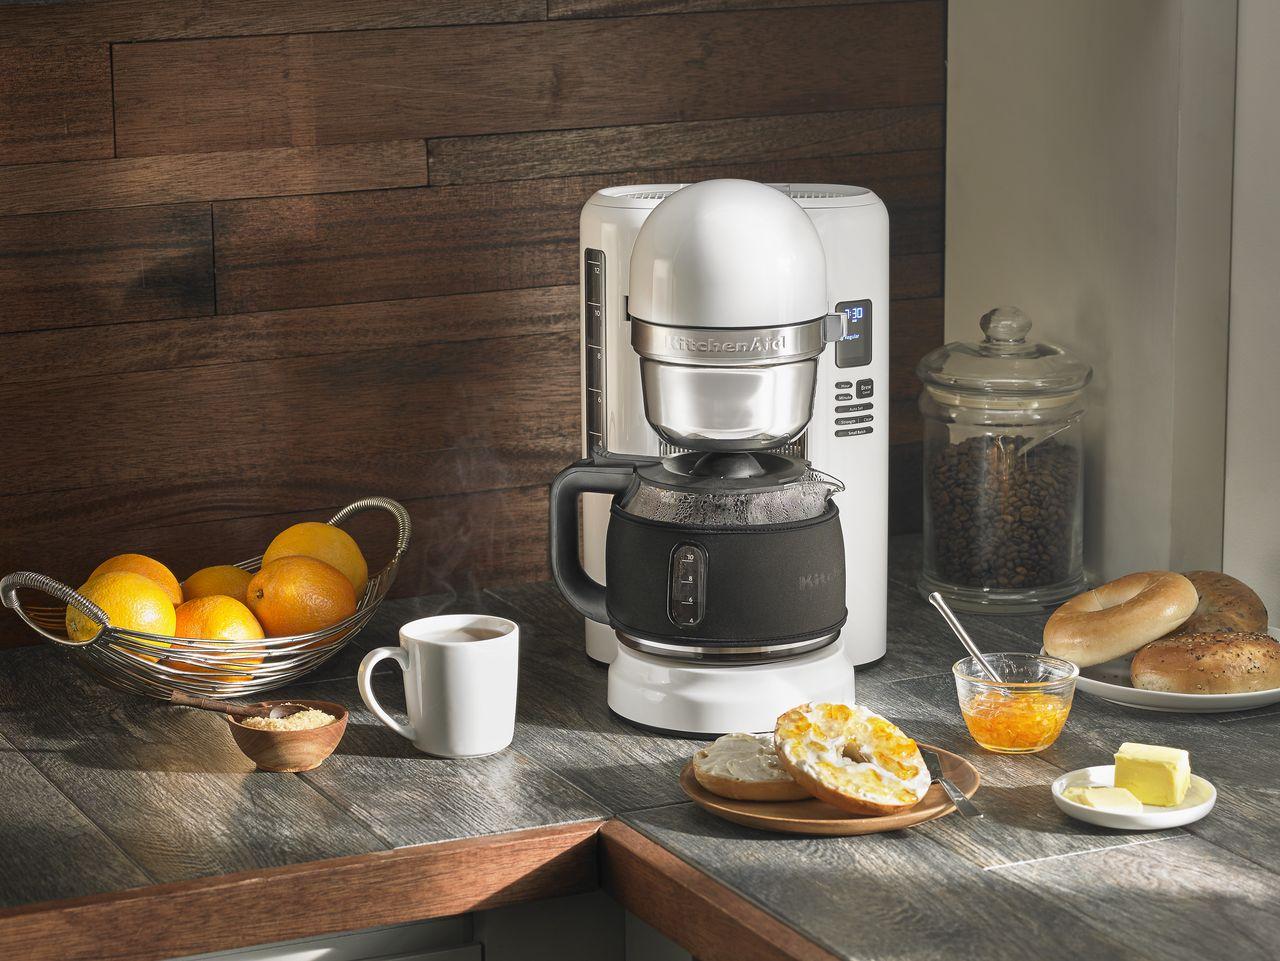 Brunch Time with KitchenAid Appliances